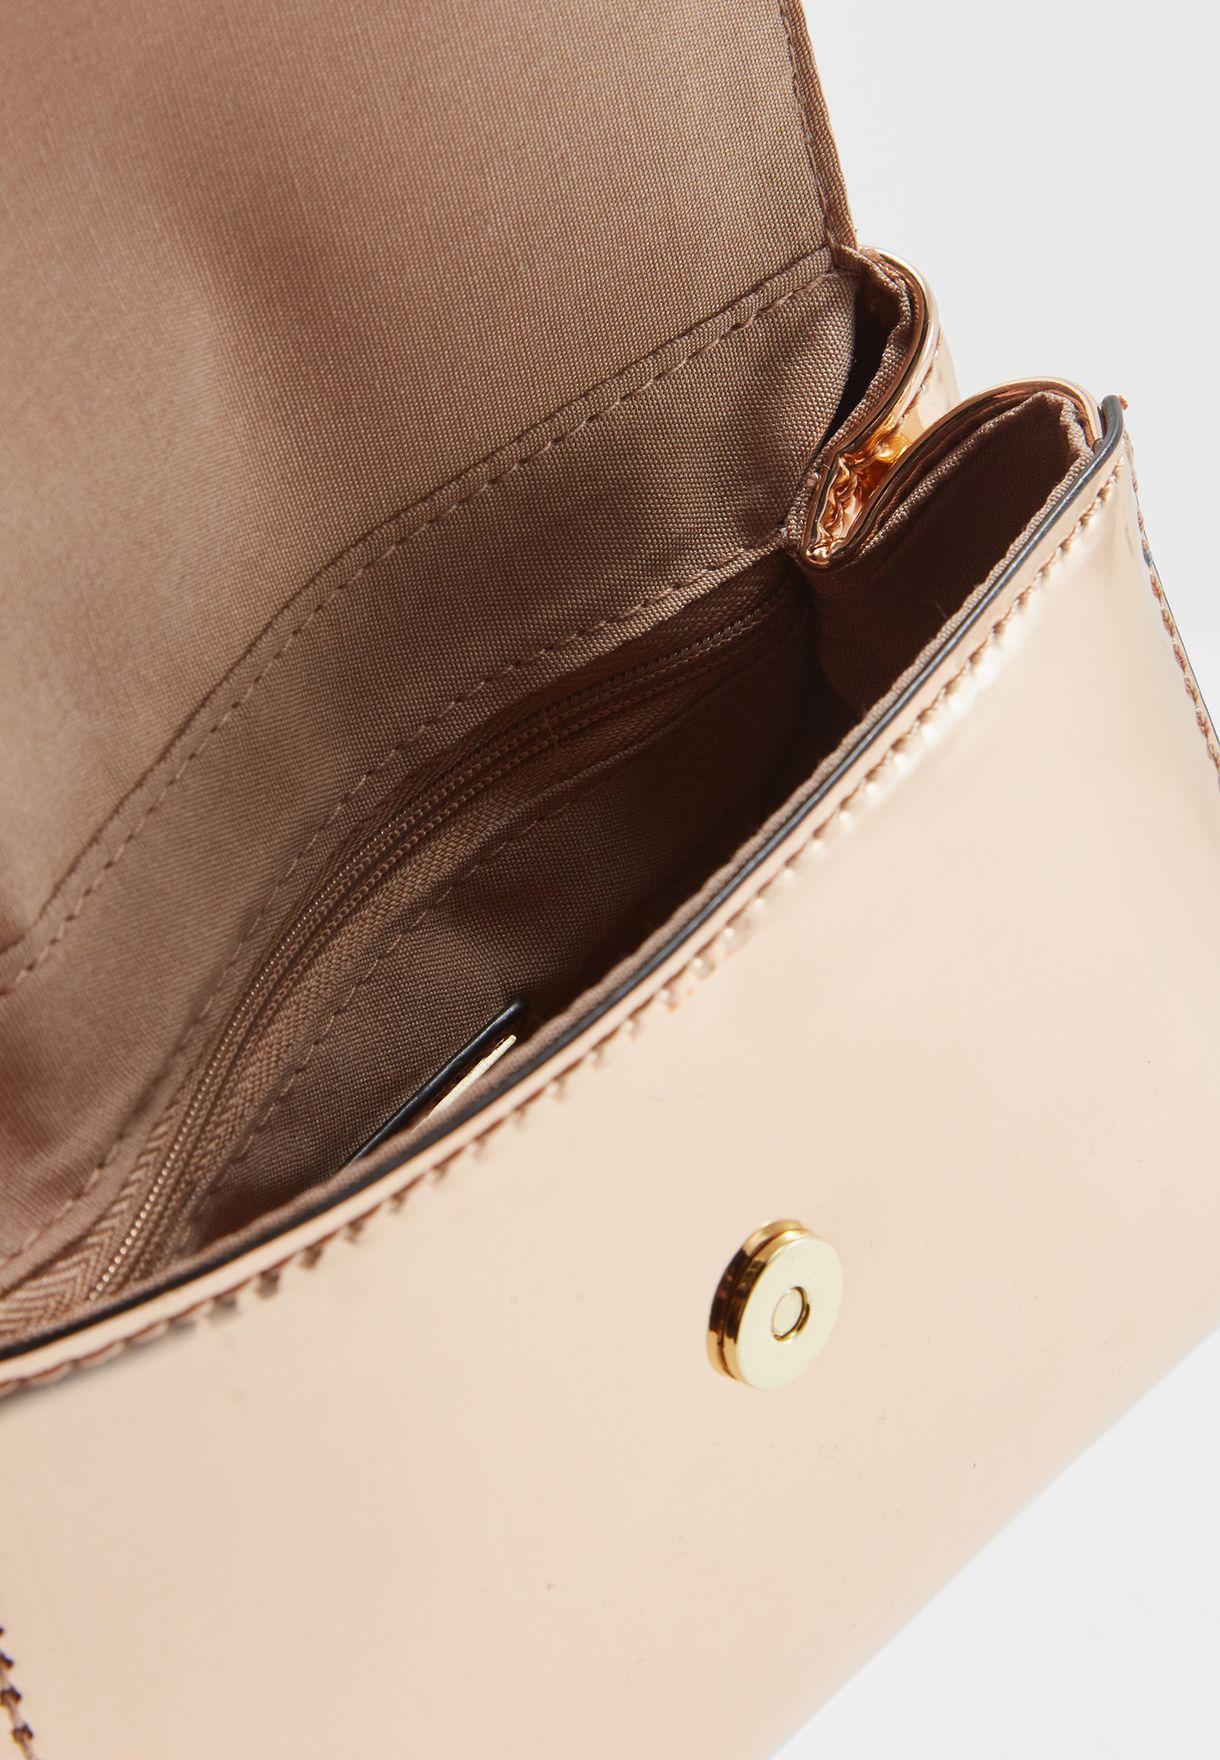 6c36f957b82 Shop Aldo gold Inloving Satchel INLOVING56 for Women in UAE ...